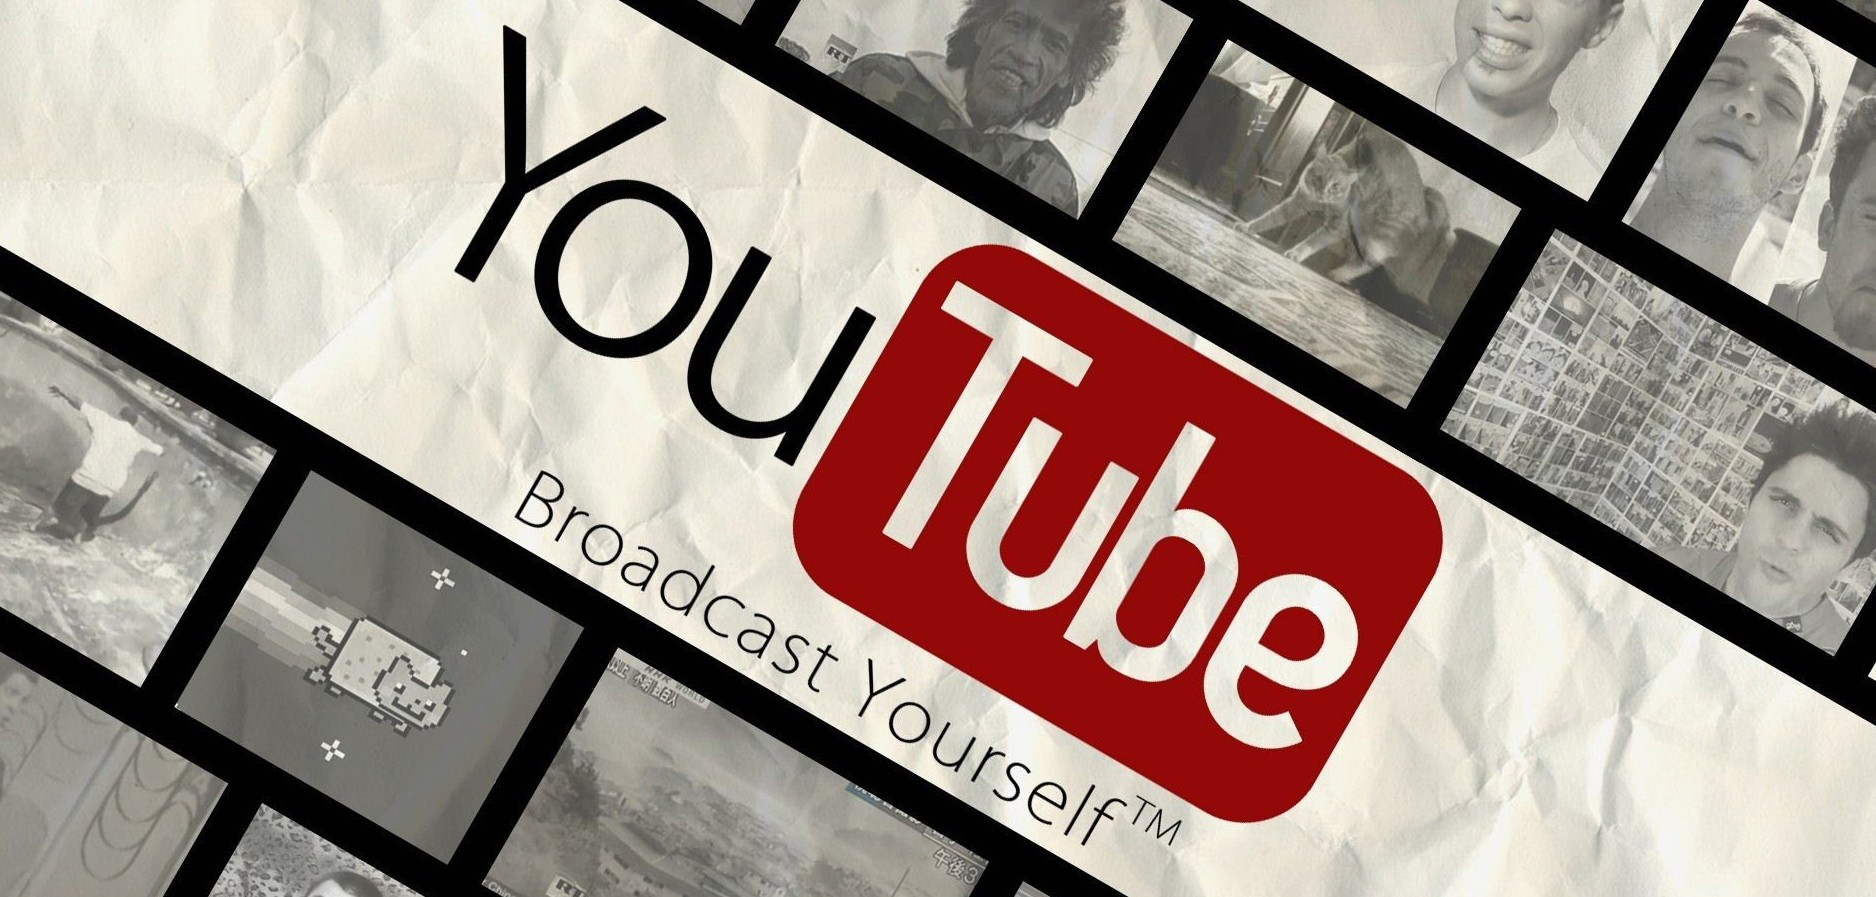 Youtube 360 Derece Video Desteği